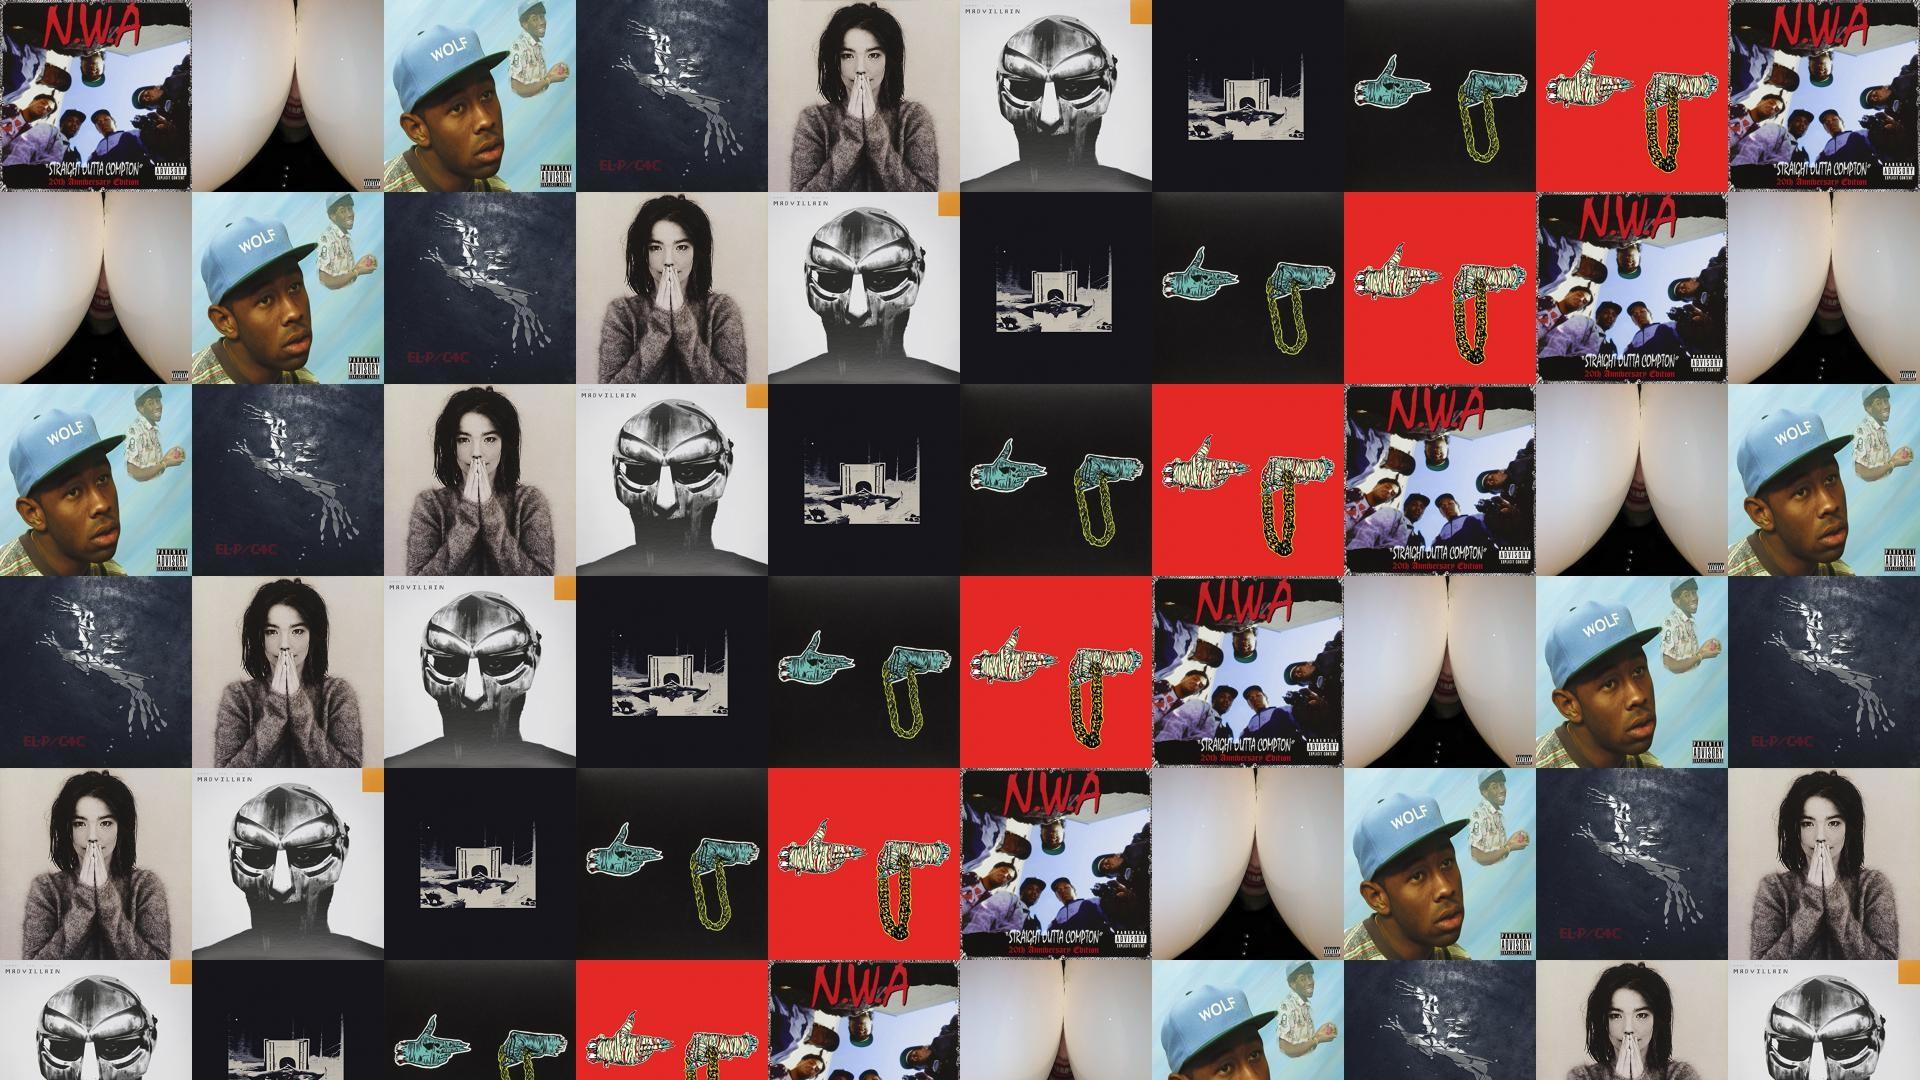 NWA Straight Outta Compton Death Grips Bottomless Pit Wallpaper Â« Tiled  Desktop Wallpaper